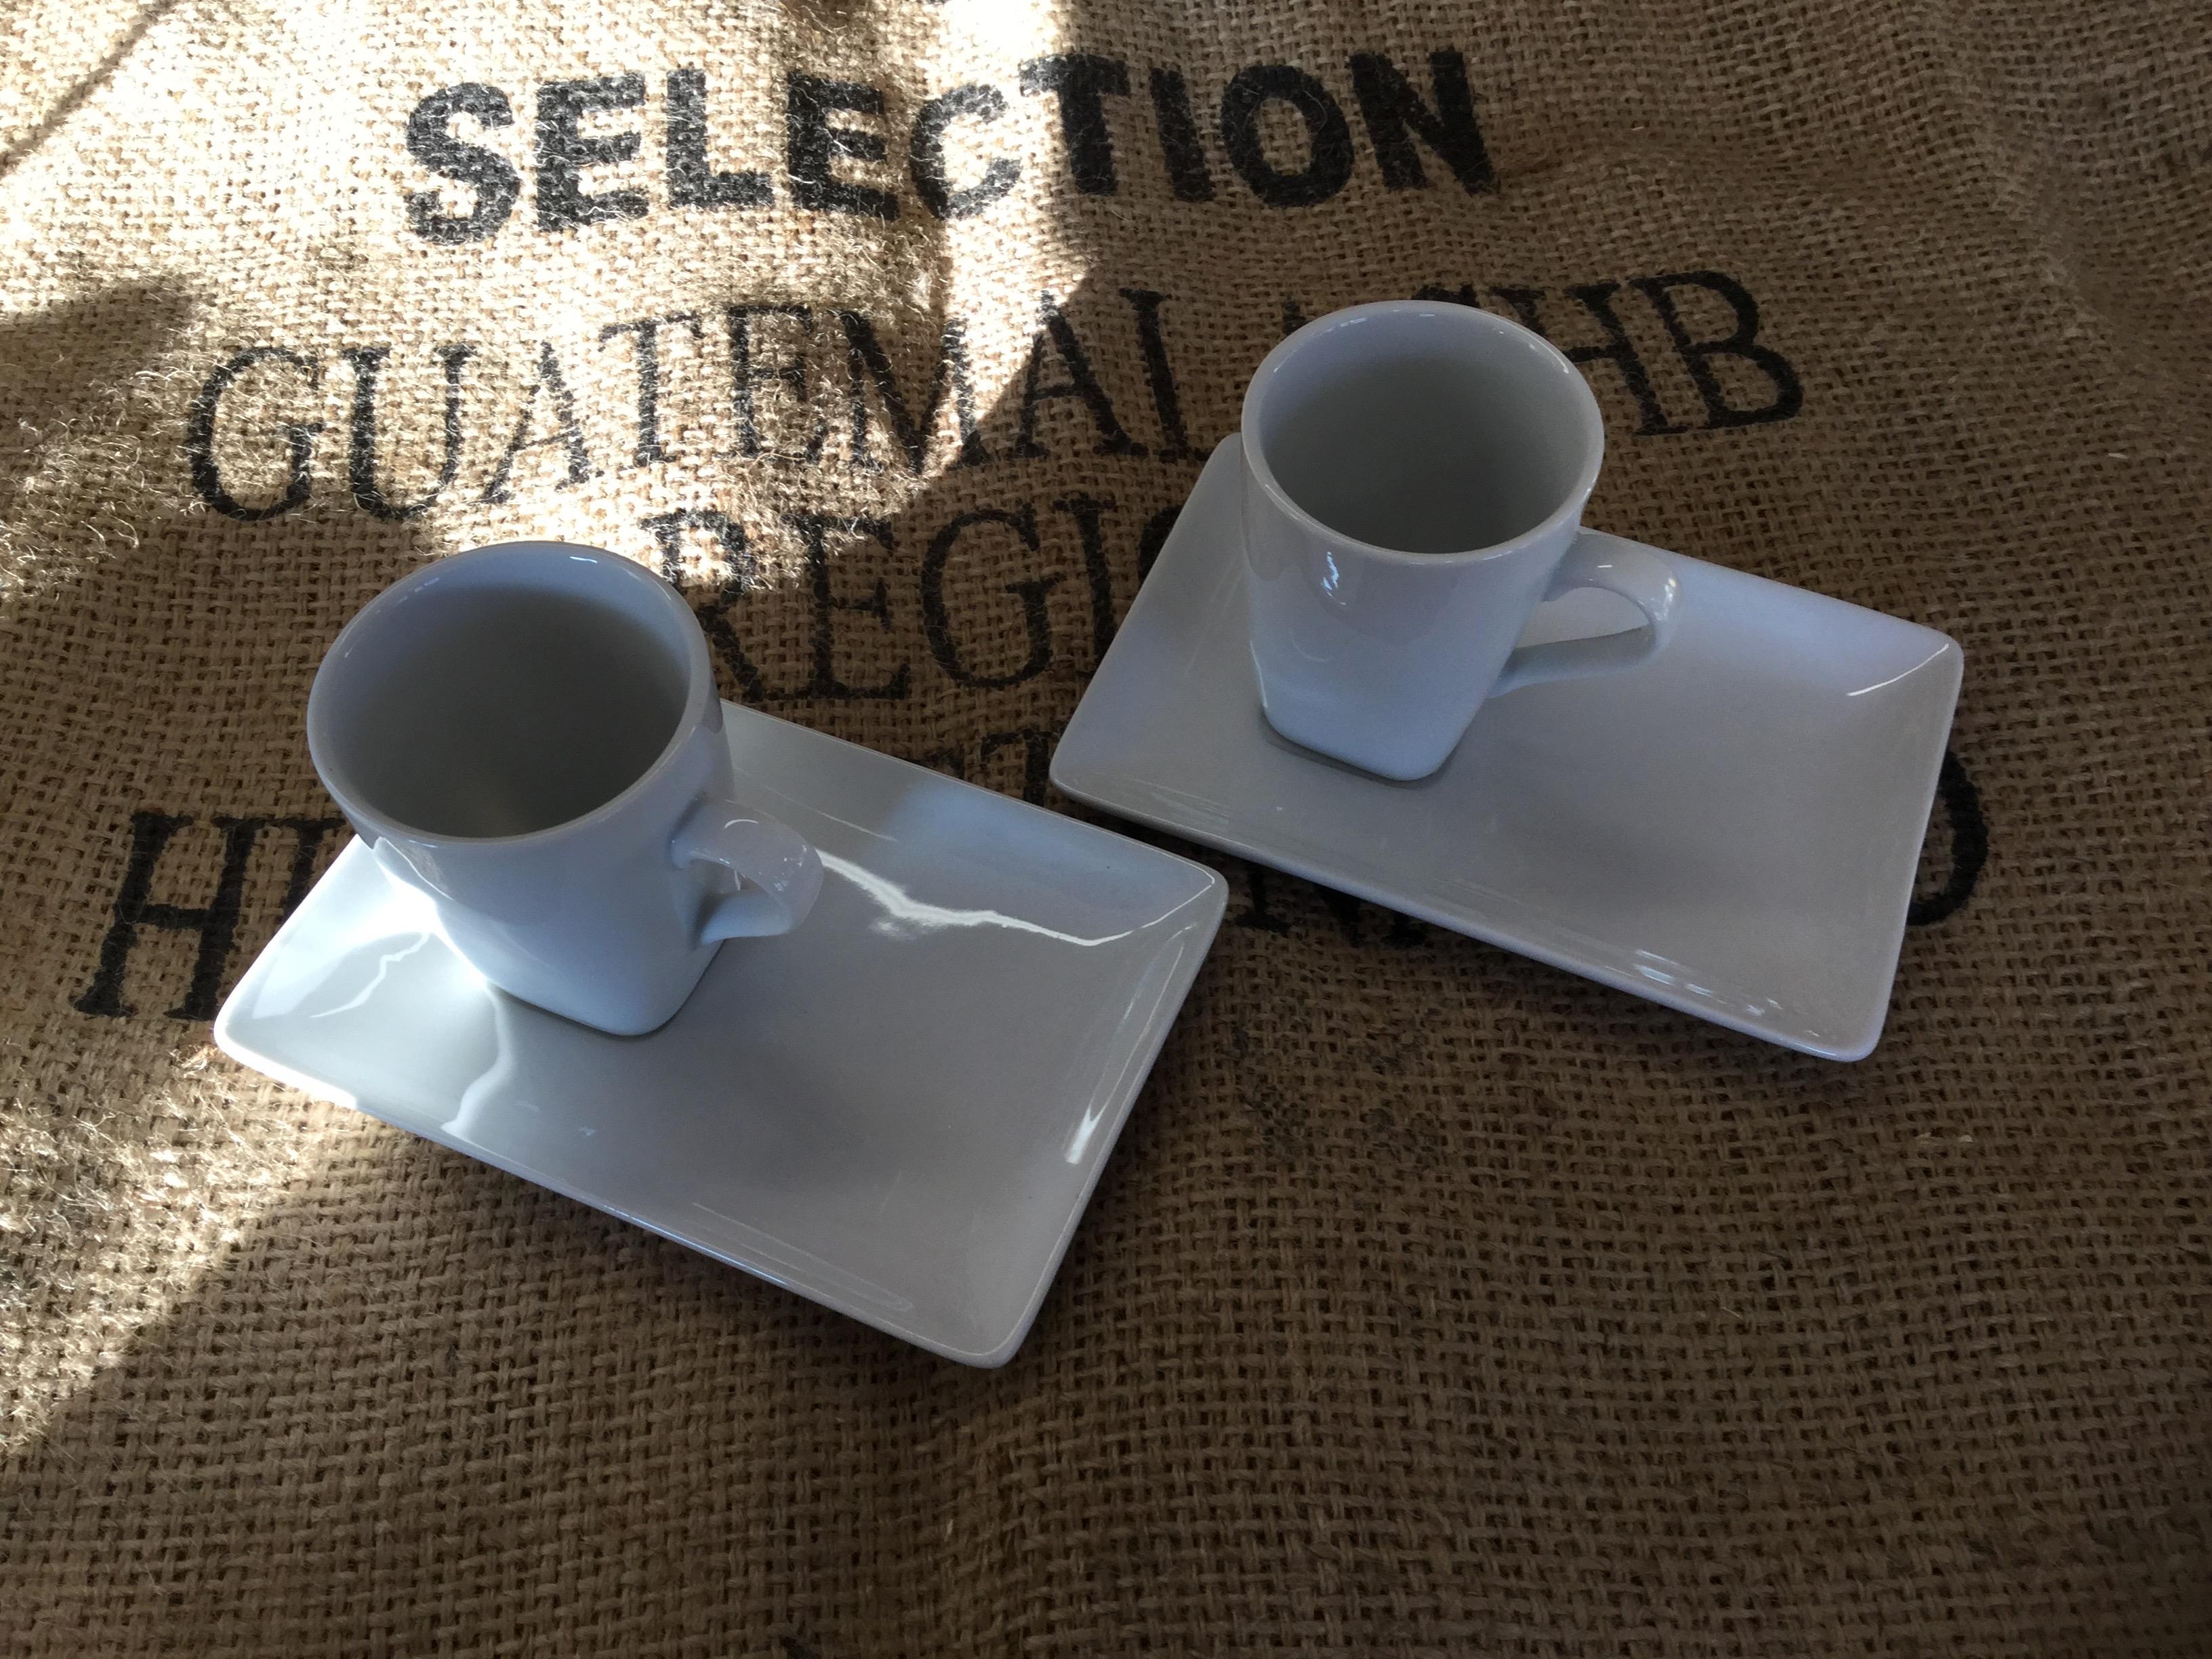 Cafe_s_gourmands-1484648323.jpg